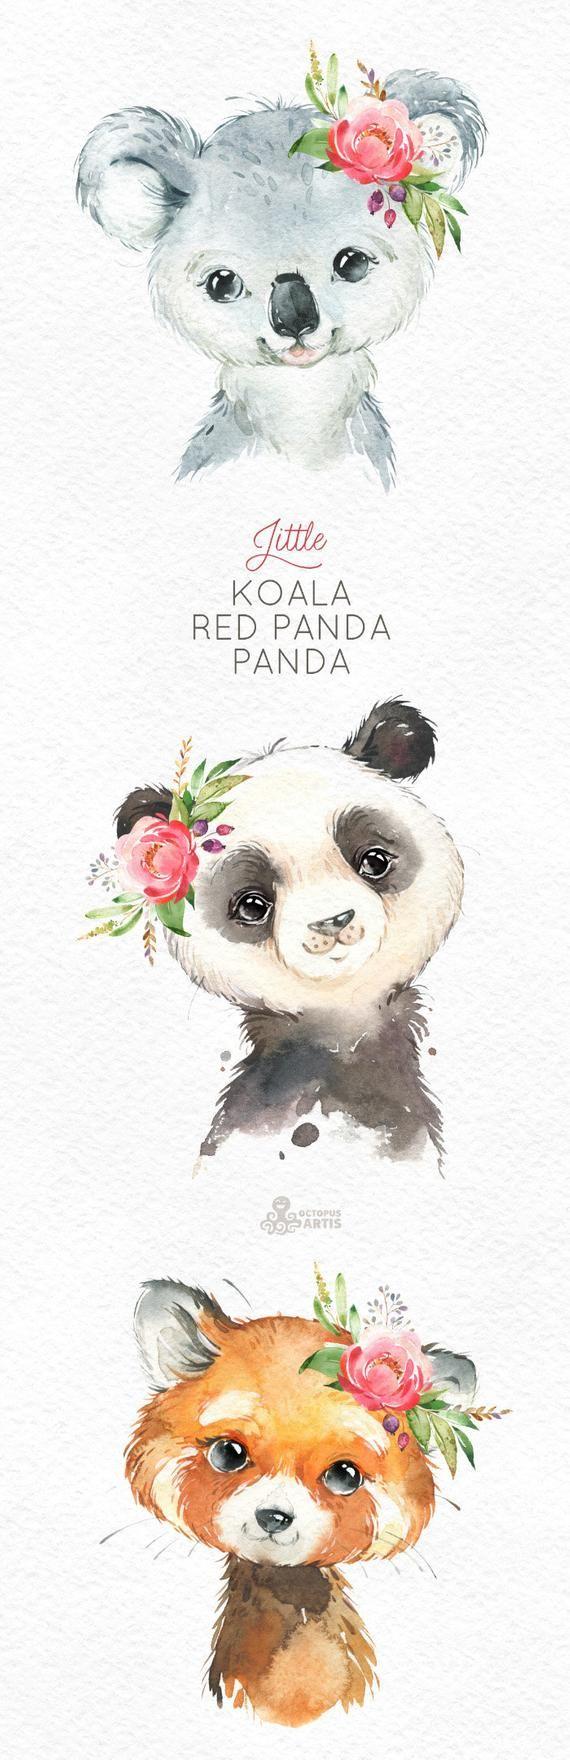 Little Koala Red Panda Panda Watercolor Animals Clipart Etsy Dessins Mignons Dessin Koala Dessin Kawaii